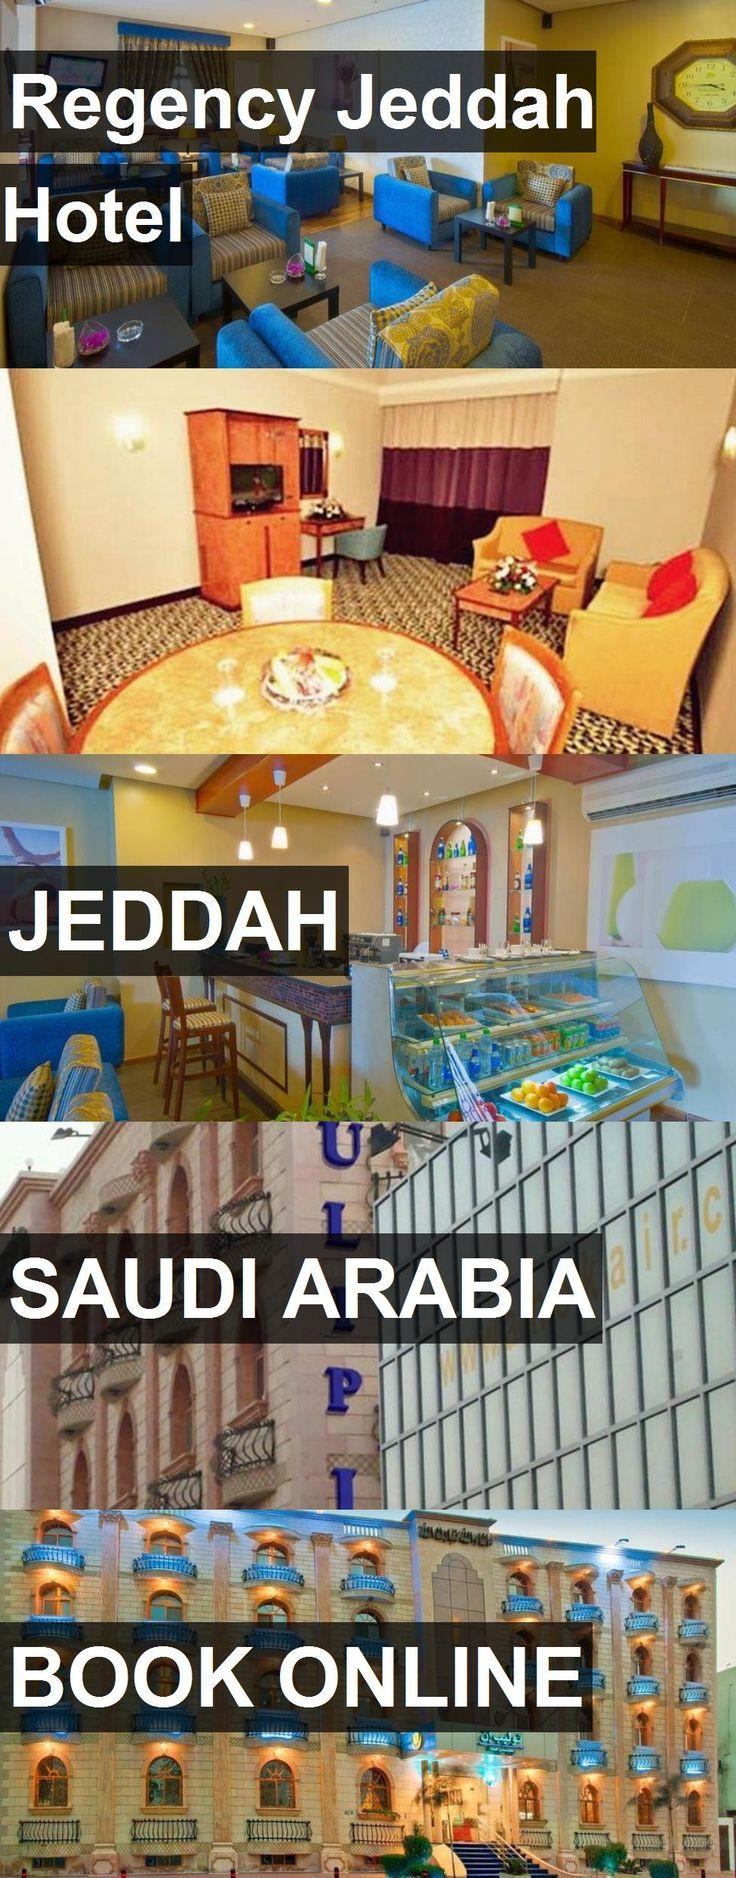 Regency Jeddah Hotel In Saudi Arabia For More Information Photos Reviews